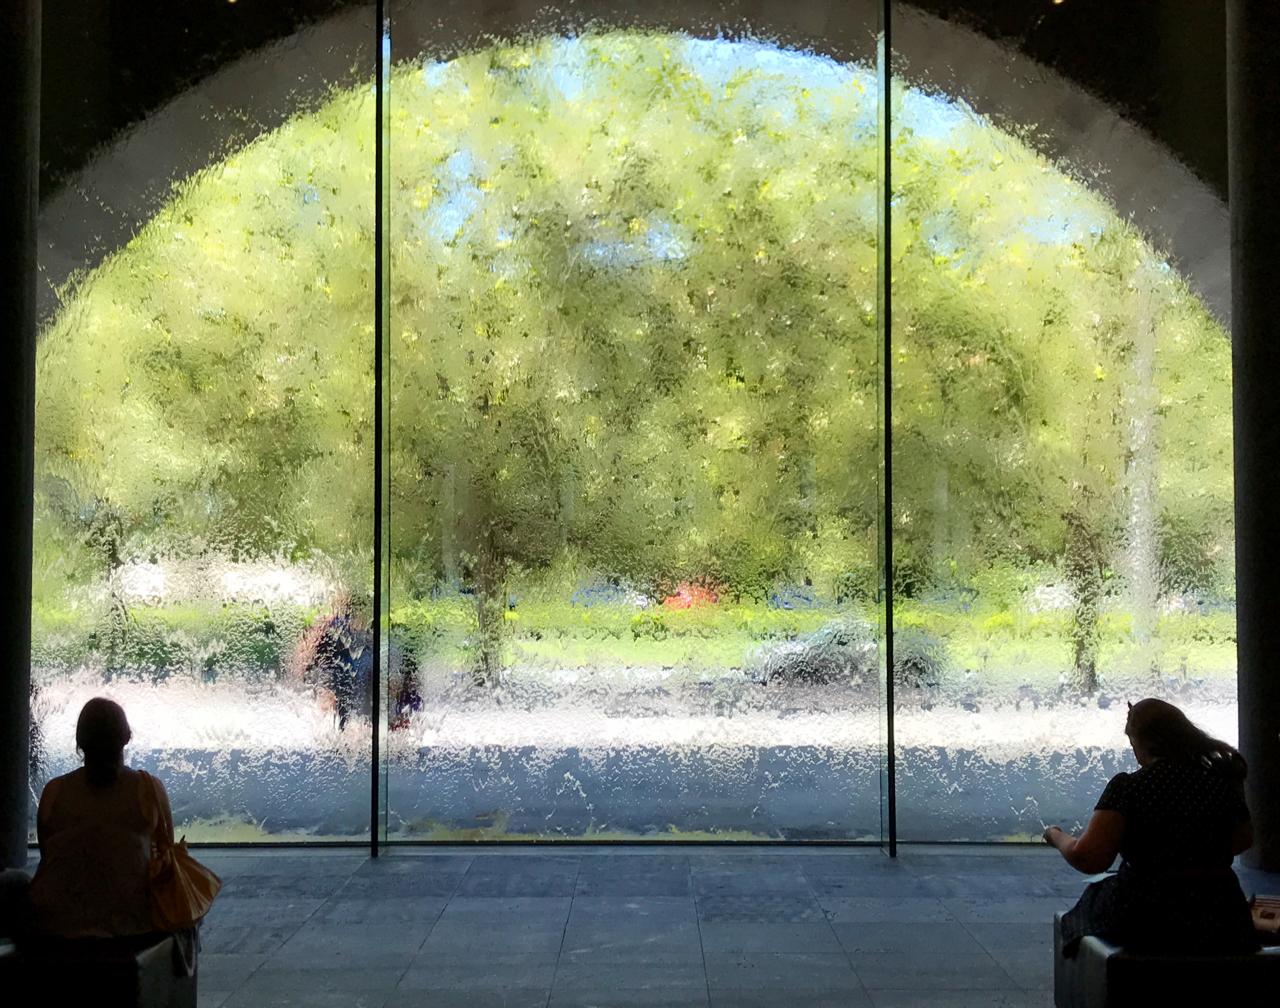 NGV's waterfall window